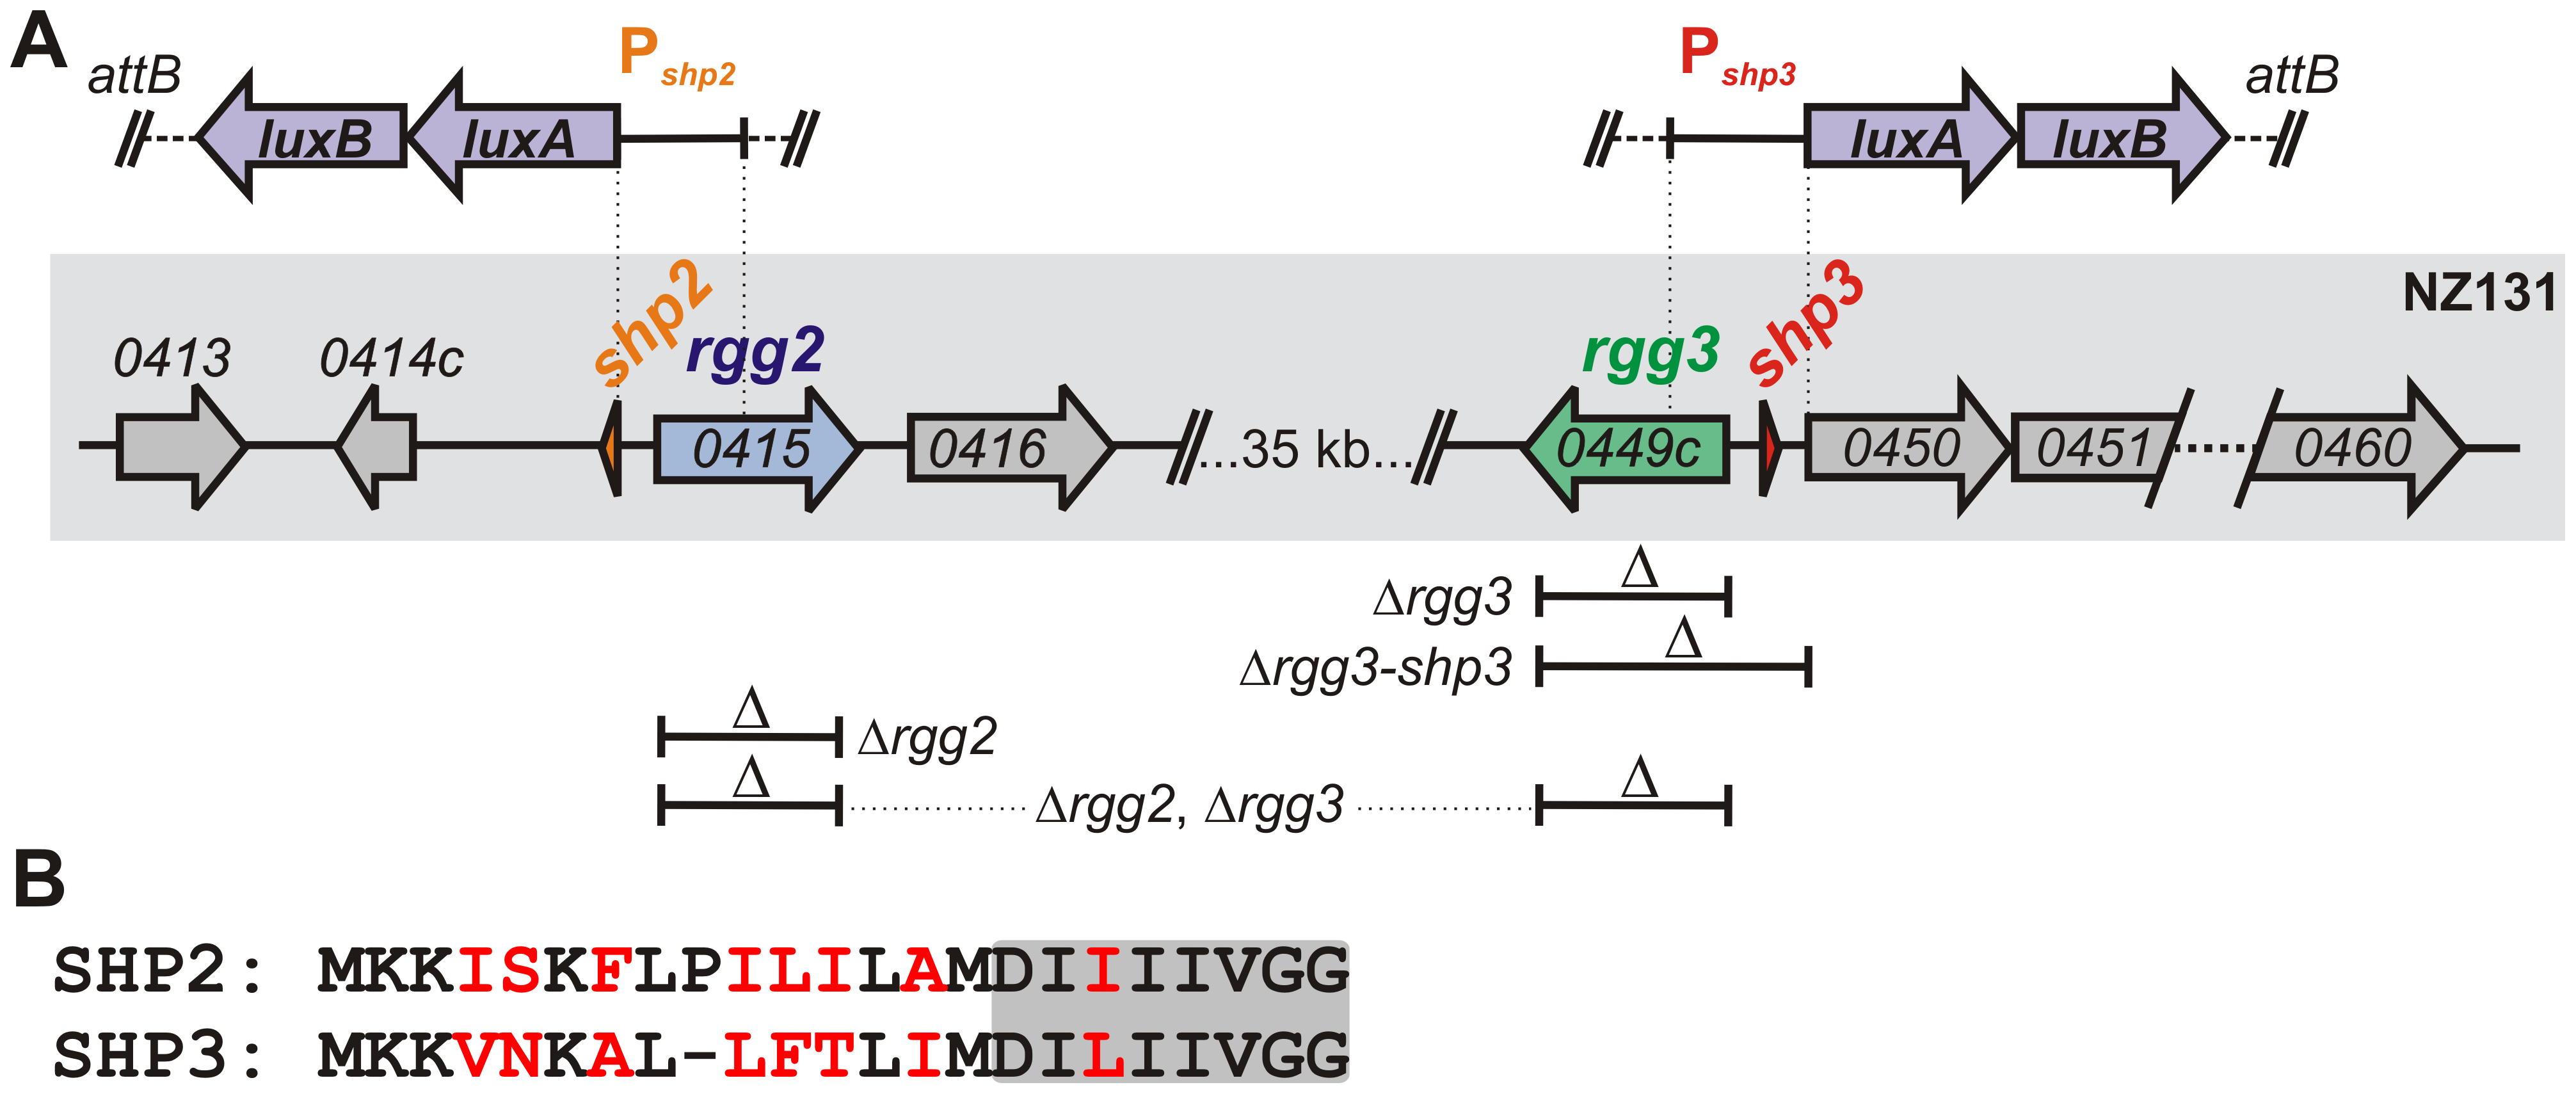 Rgg regulators in the <i>S. pyogenes</i> NZ131 genome.